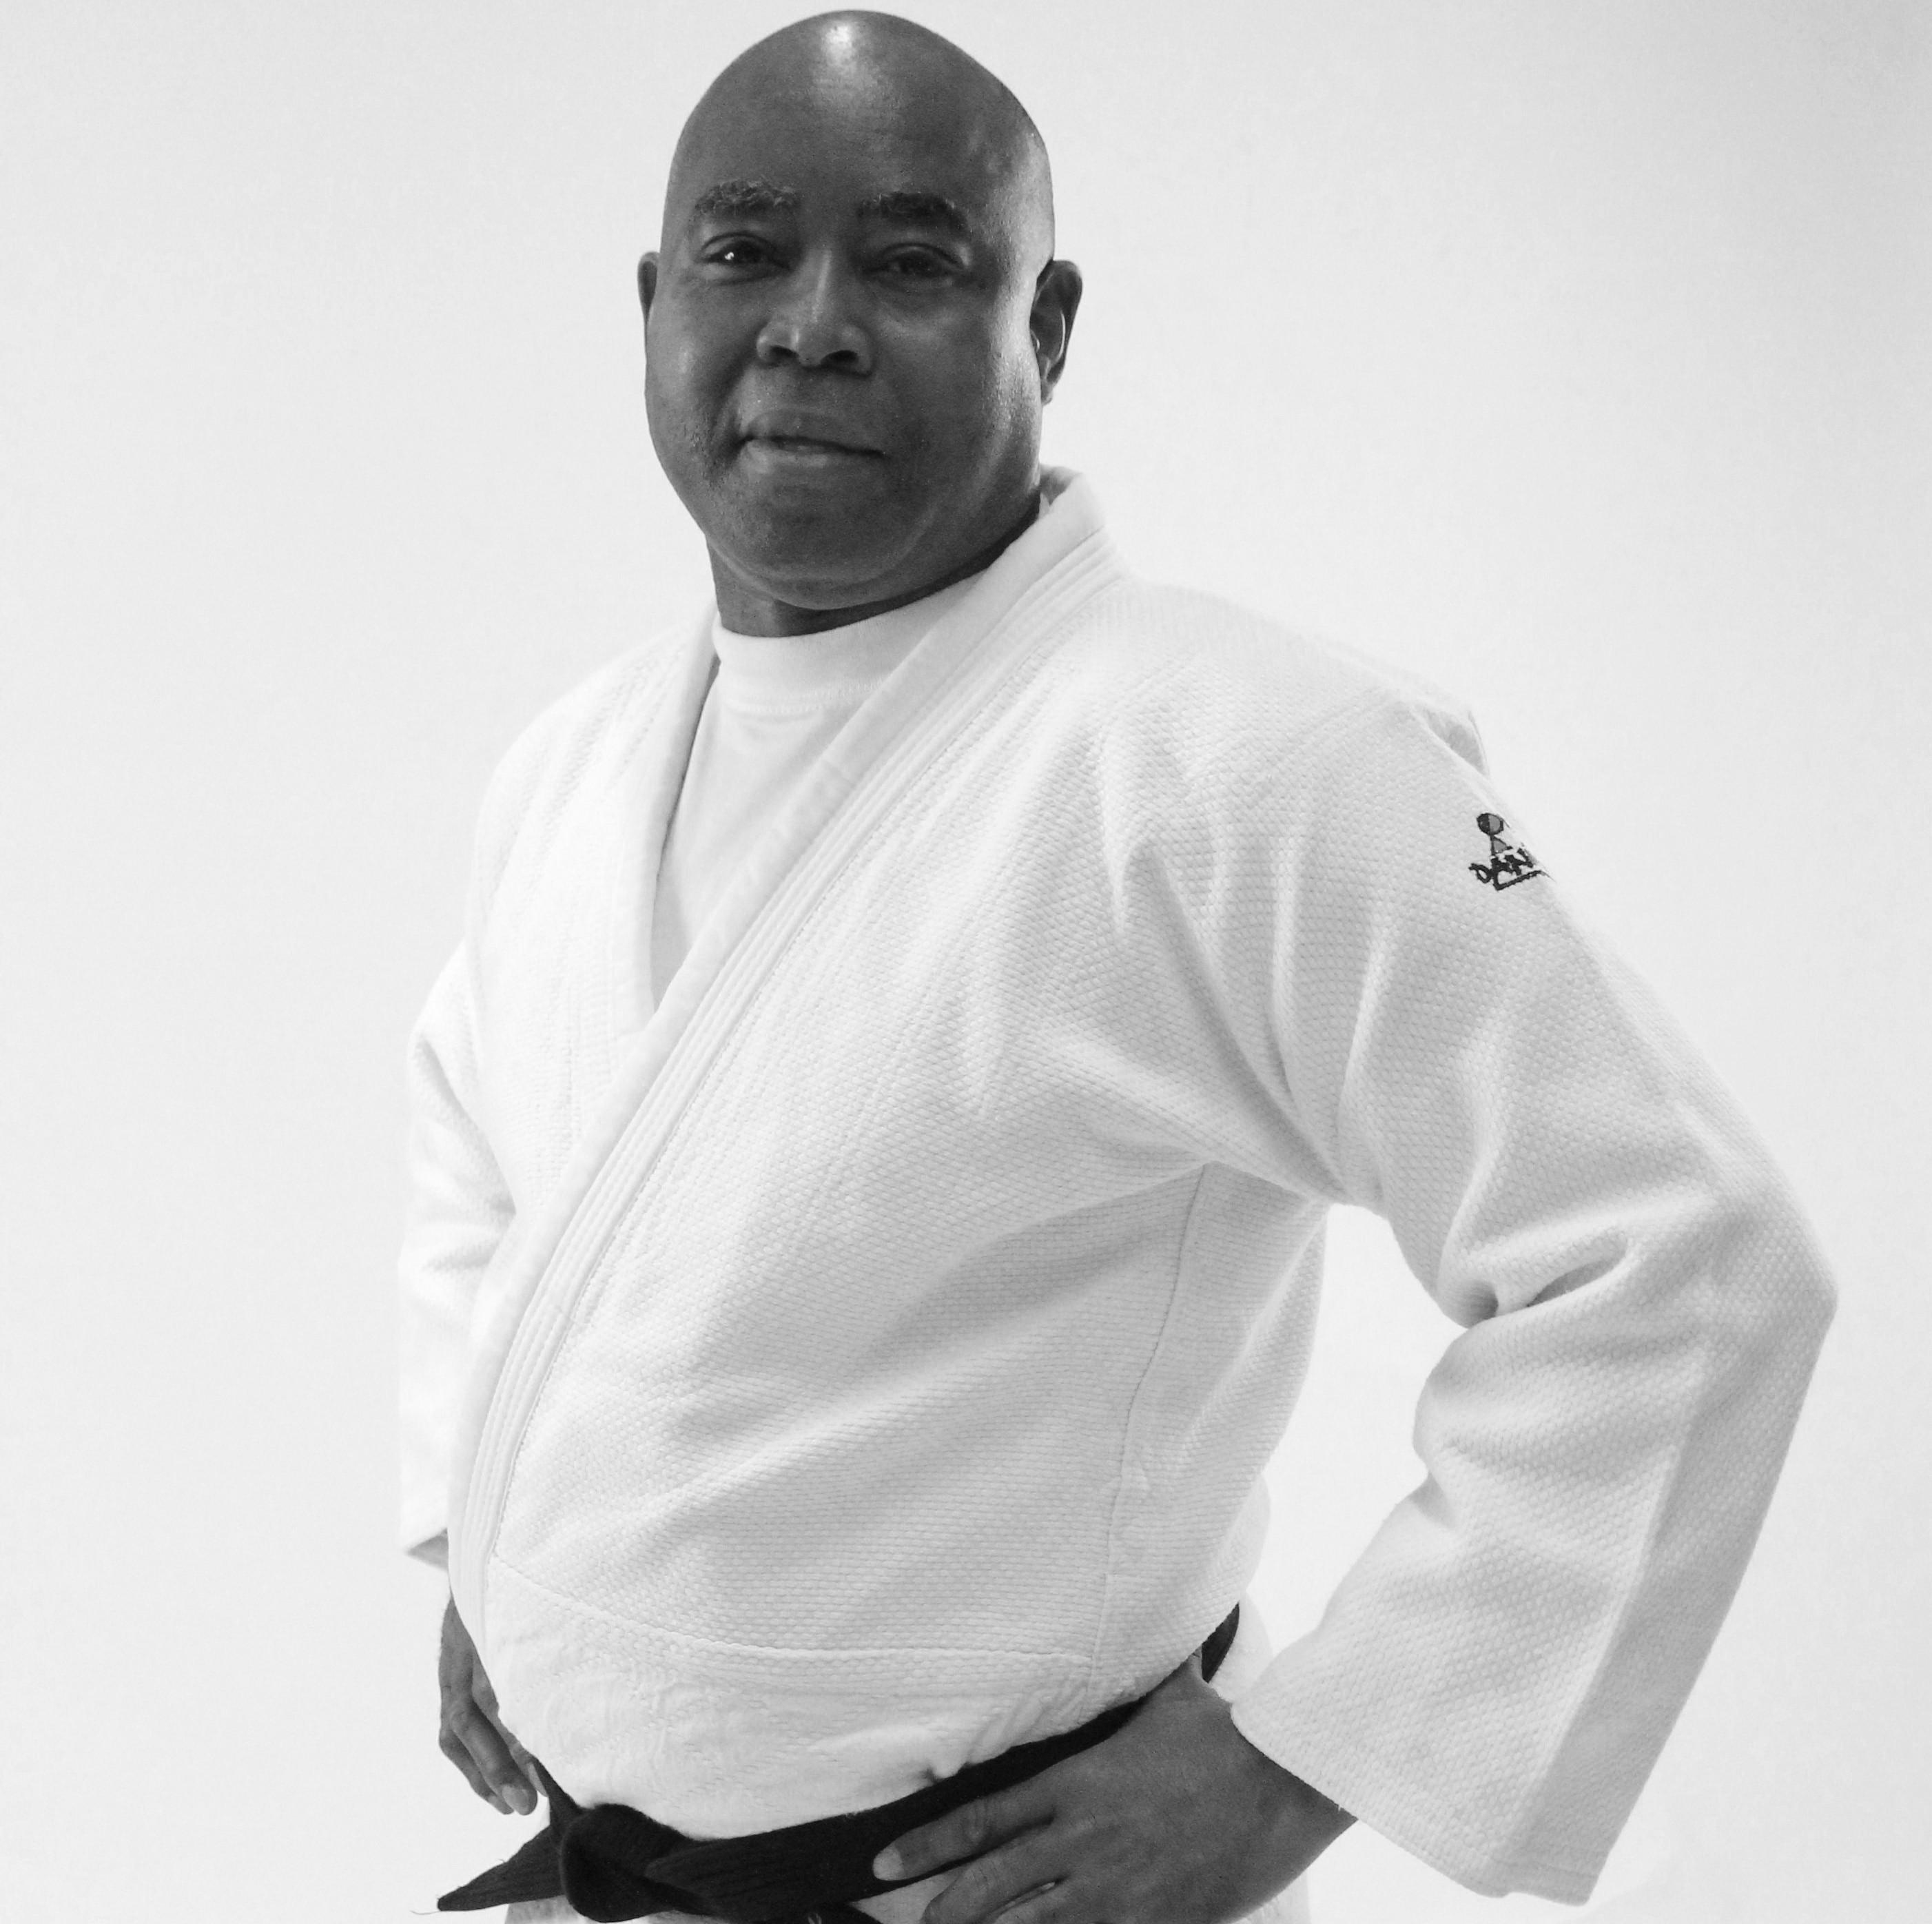 Simon Tshiko-Mulu